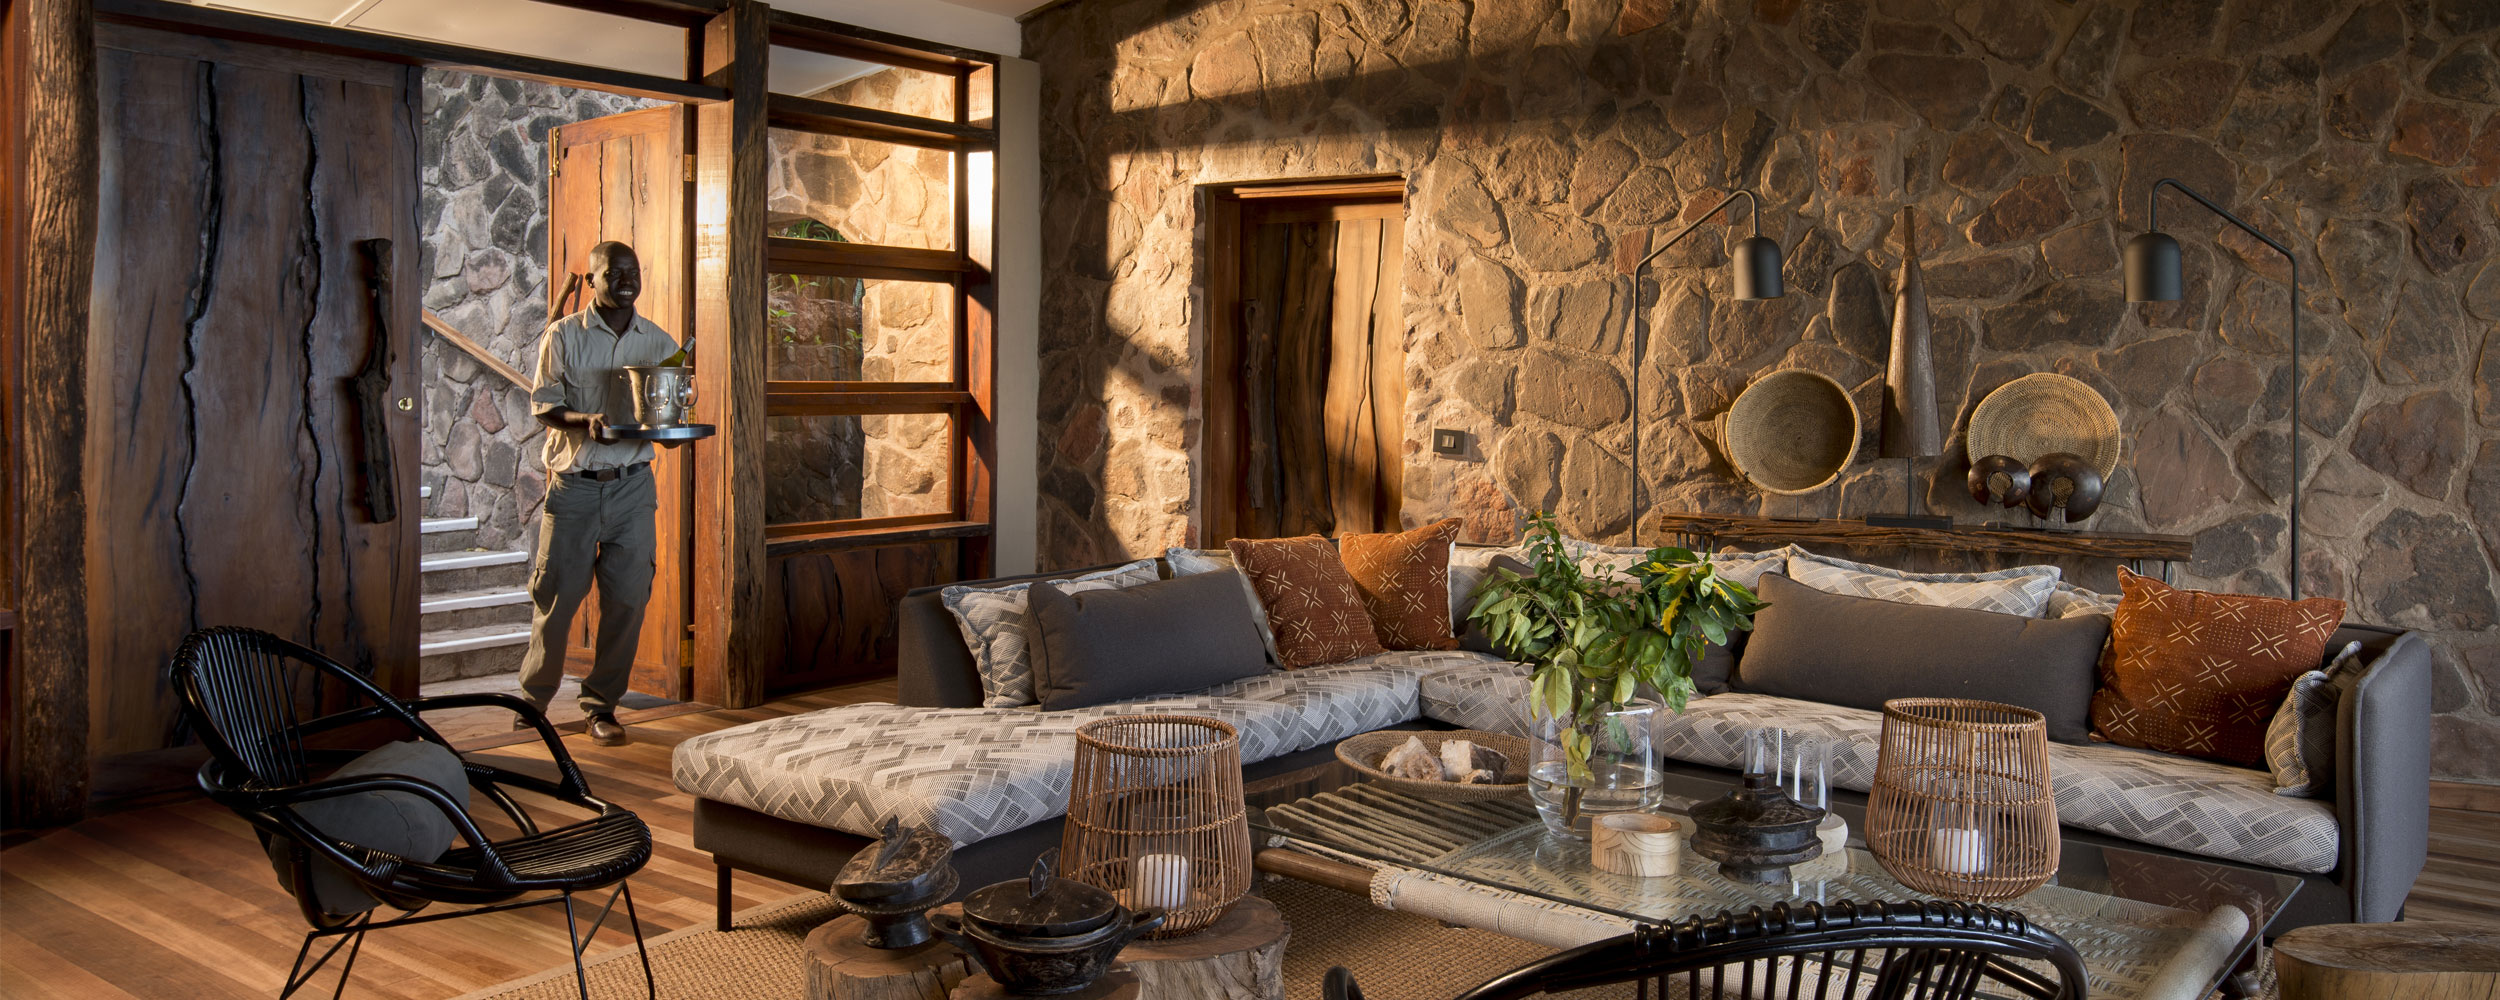 interior design courses in zimbabwe africa